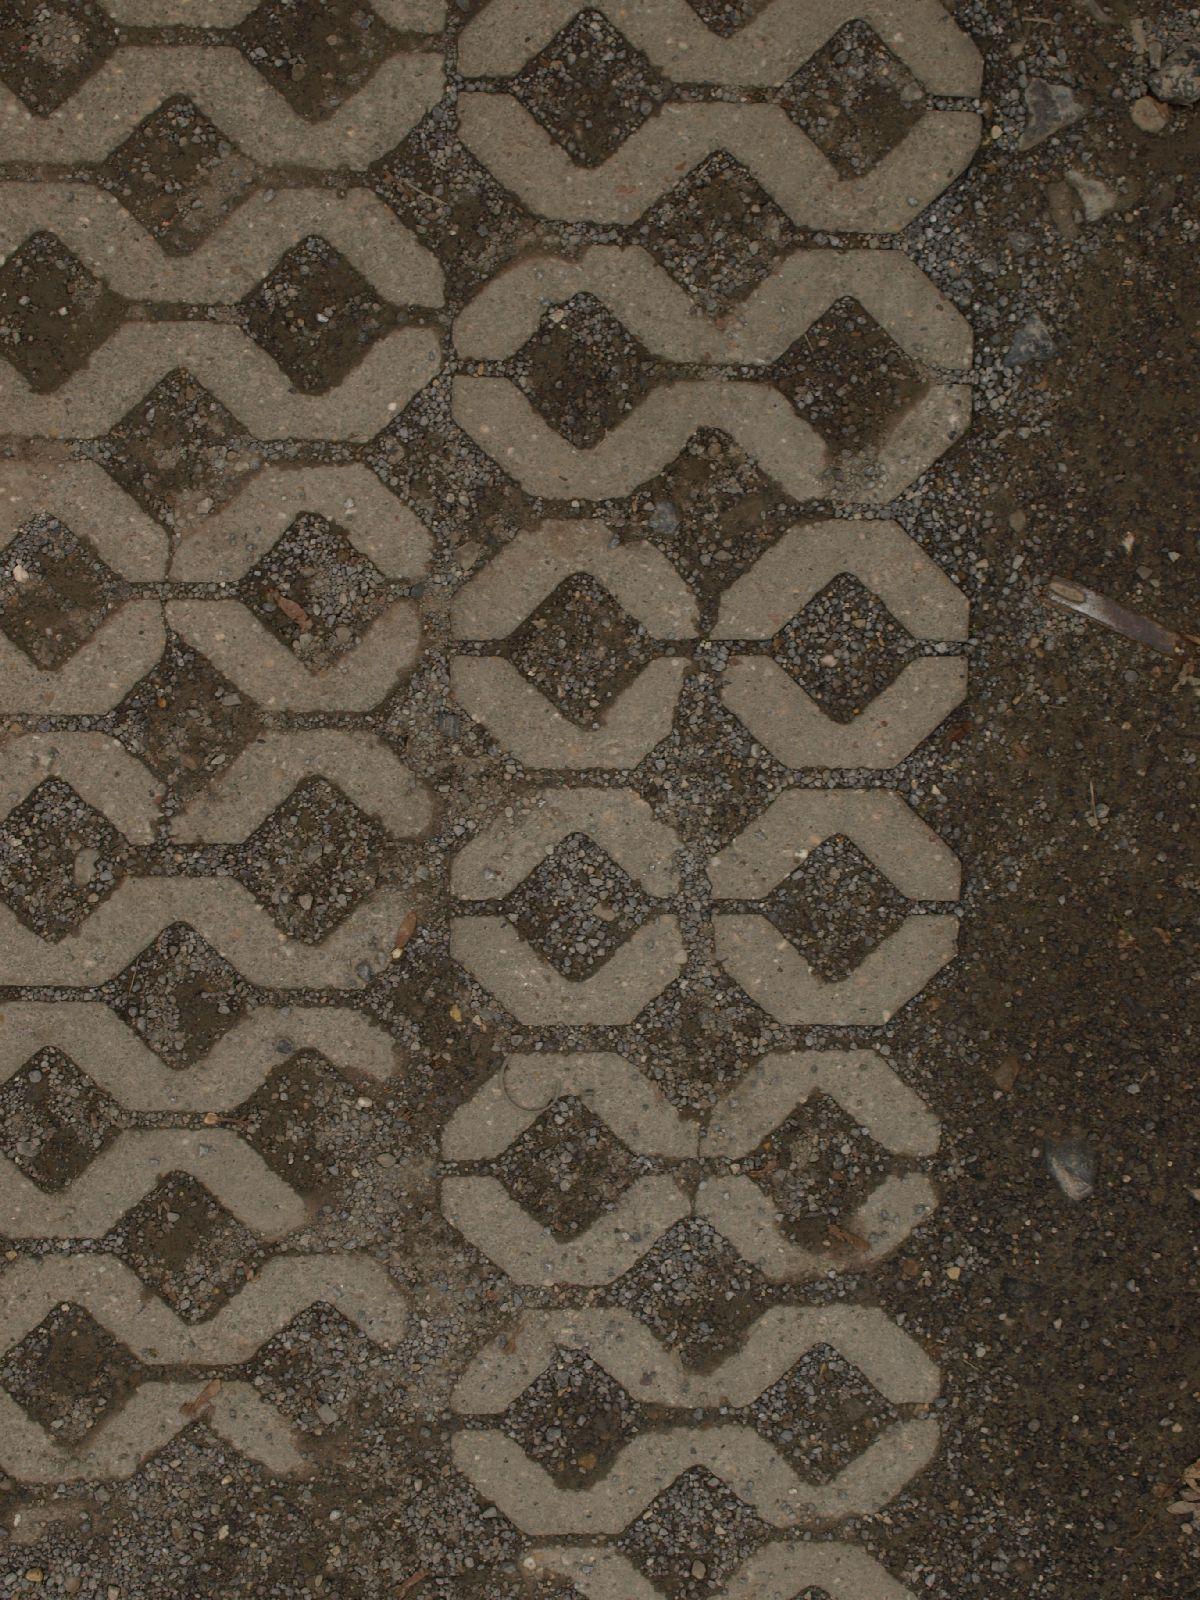 Ground-Urban_Texture_A_PA270707